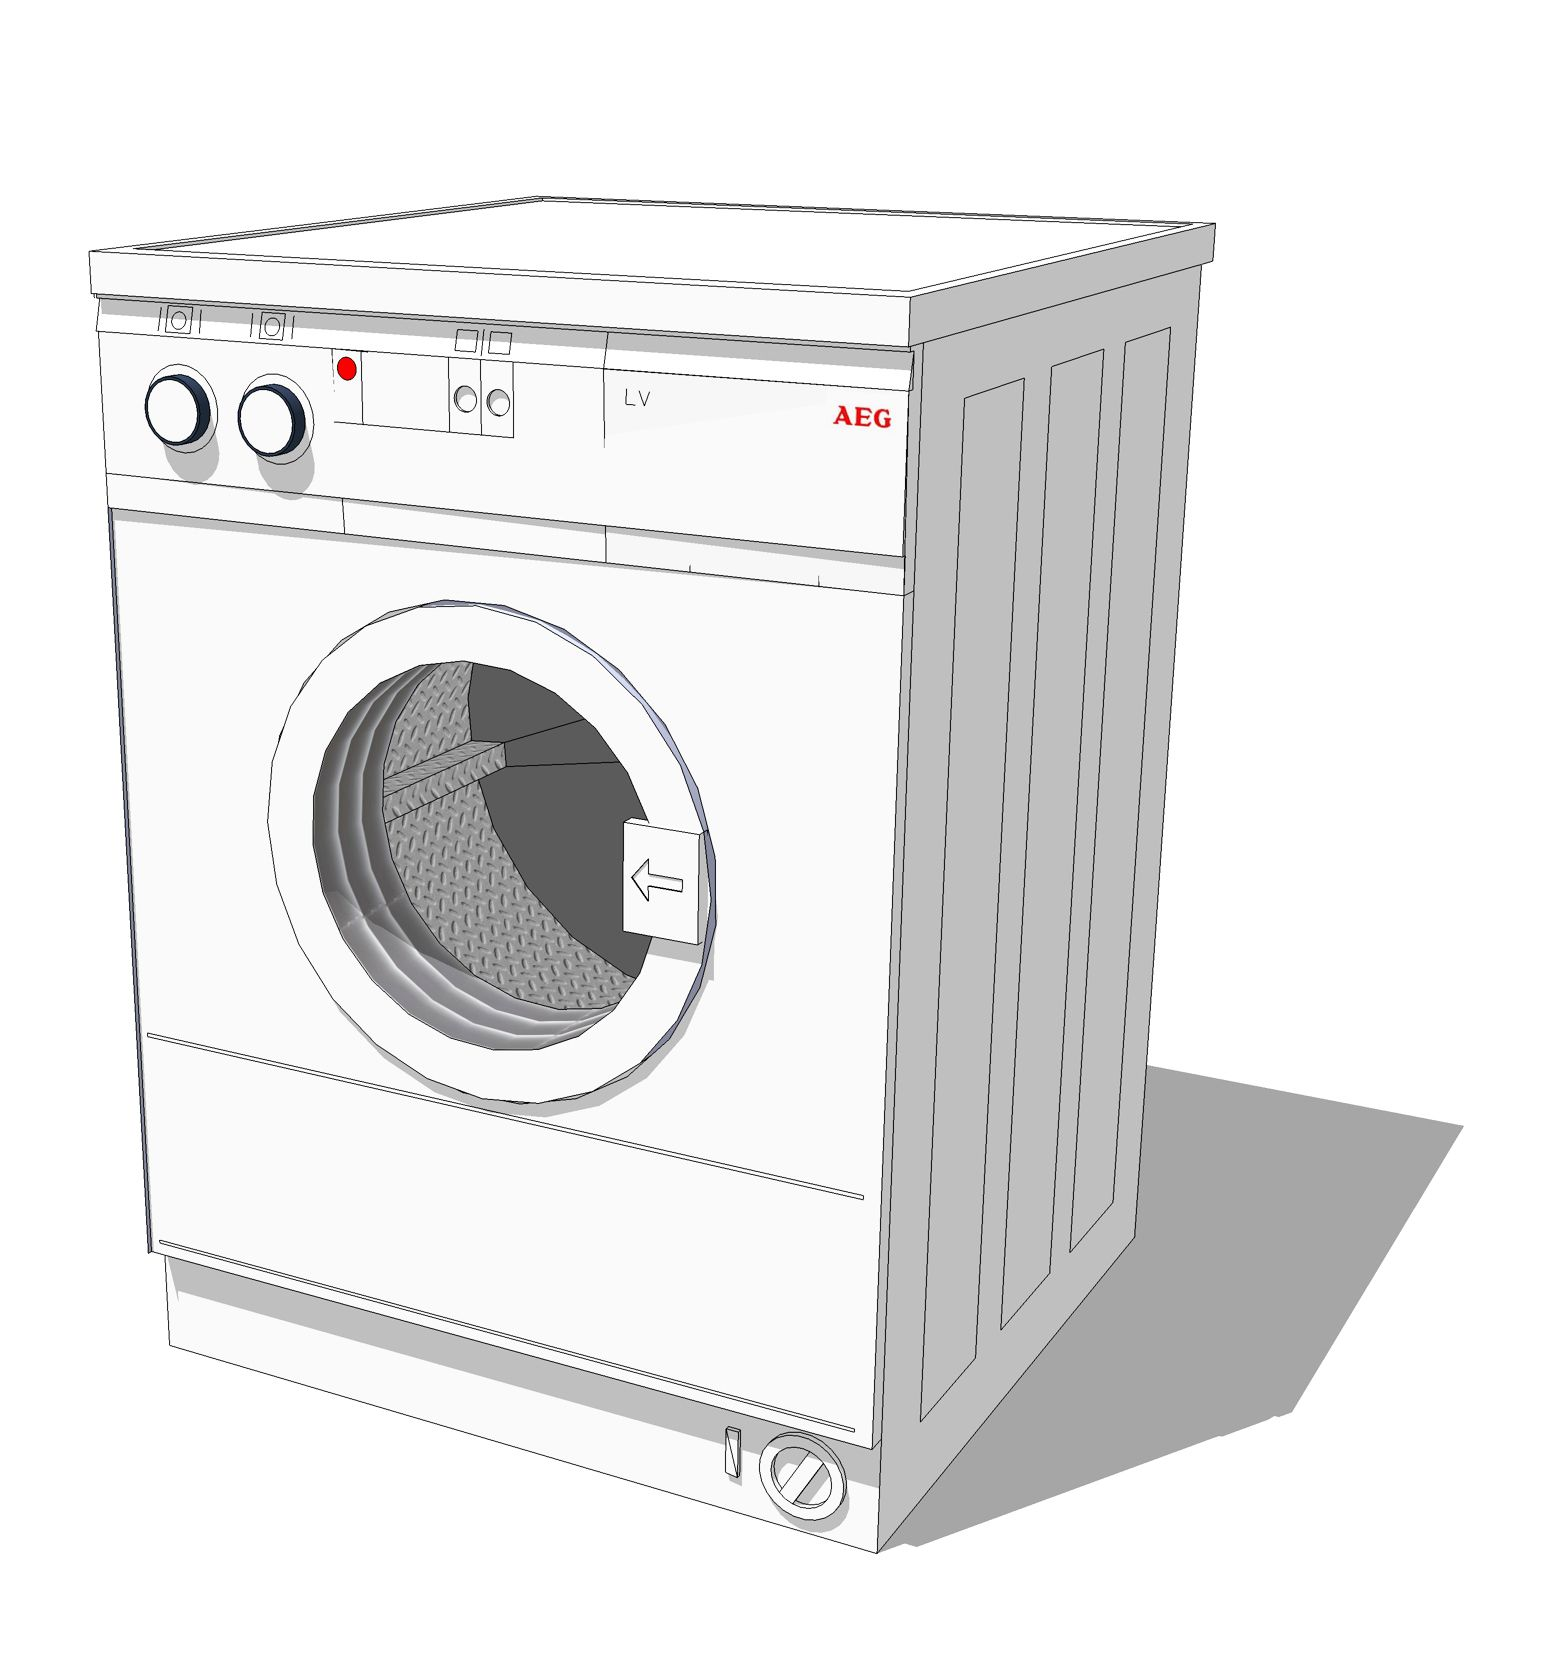 Washing Machine Drawing ~ Elevation plan drawing google search ındustrıal desıgn